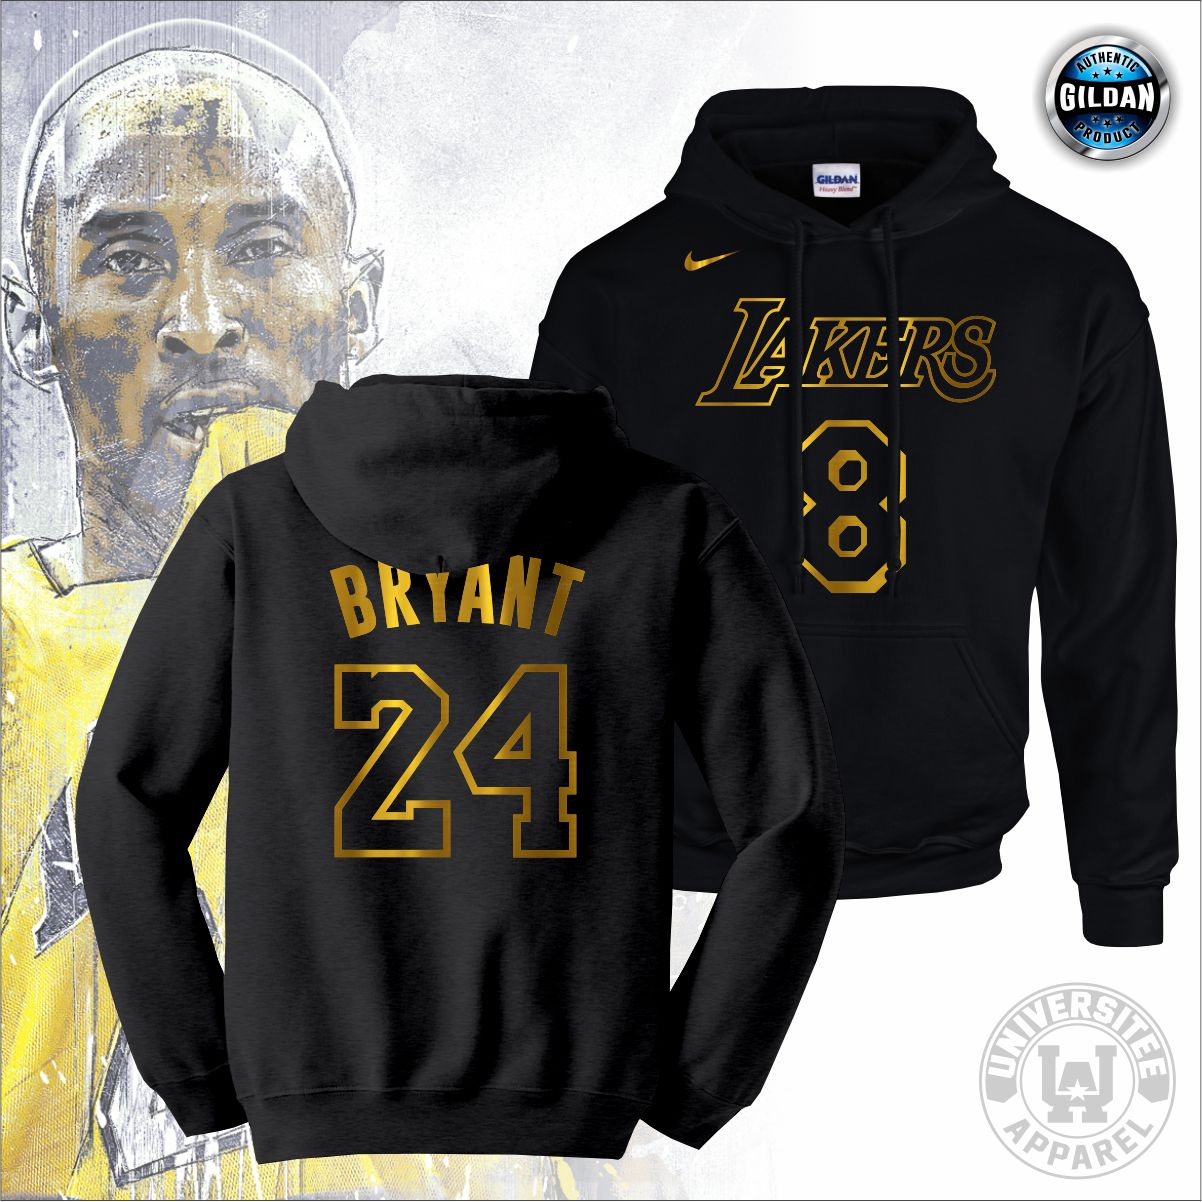 Original GILDAN Brand NBA Los Angeles